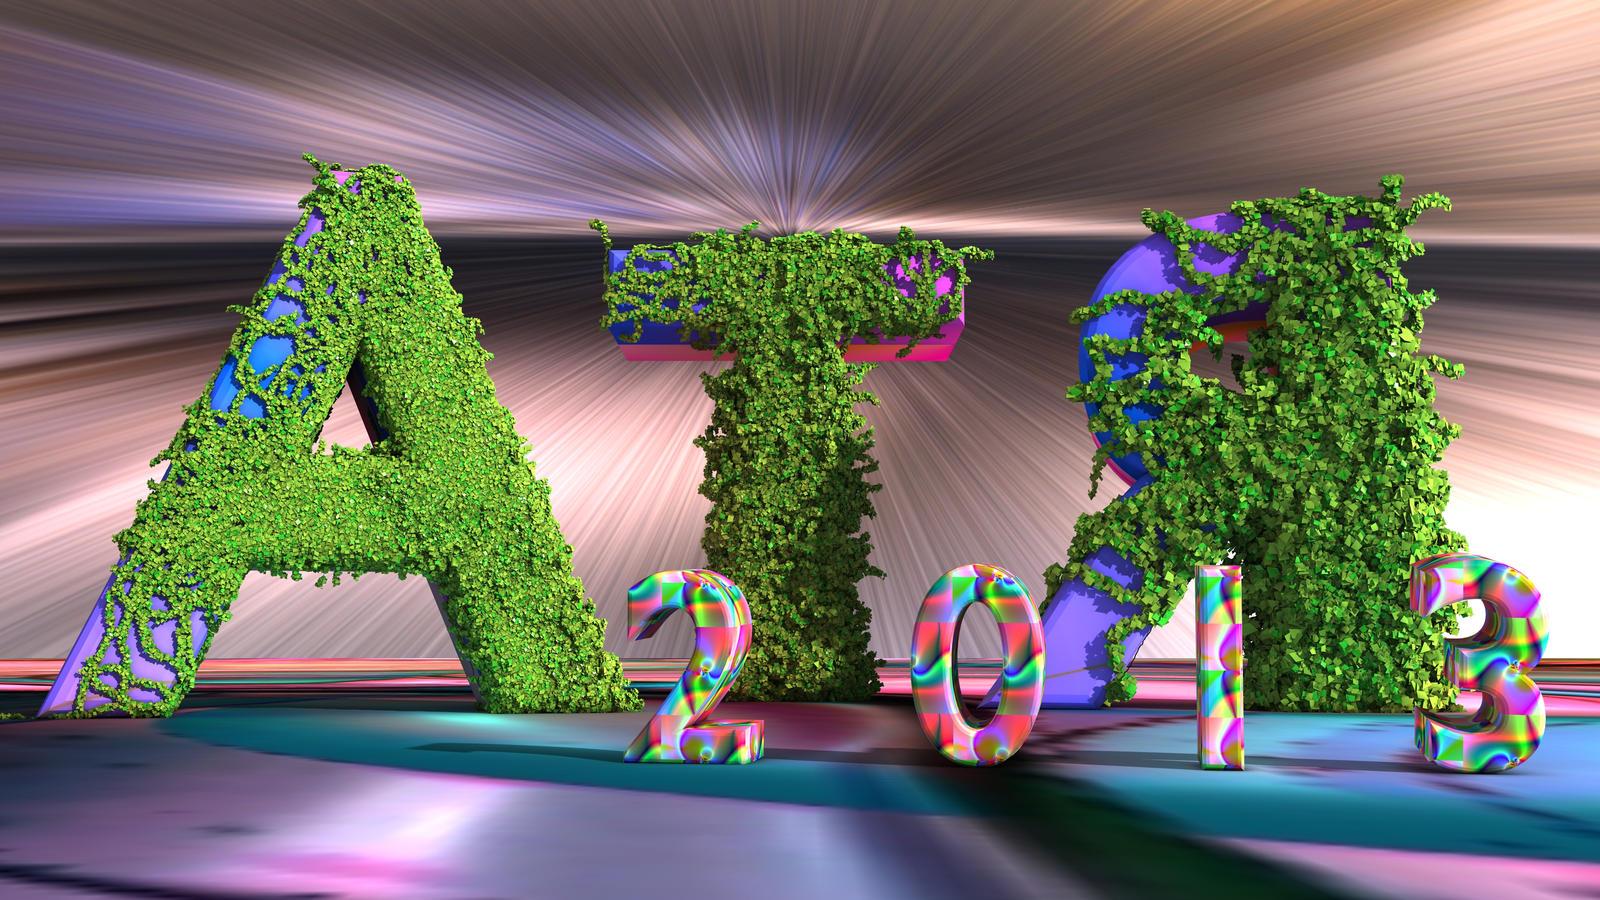 ART 2013 by nic022